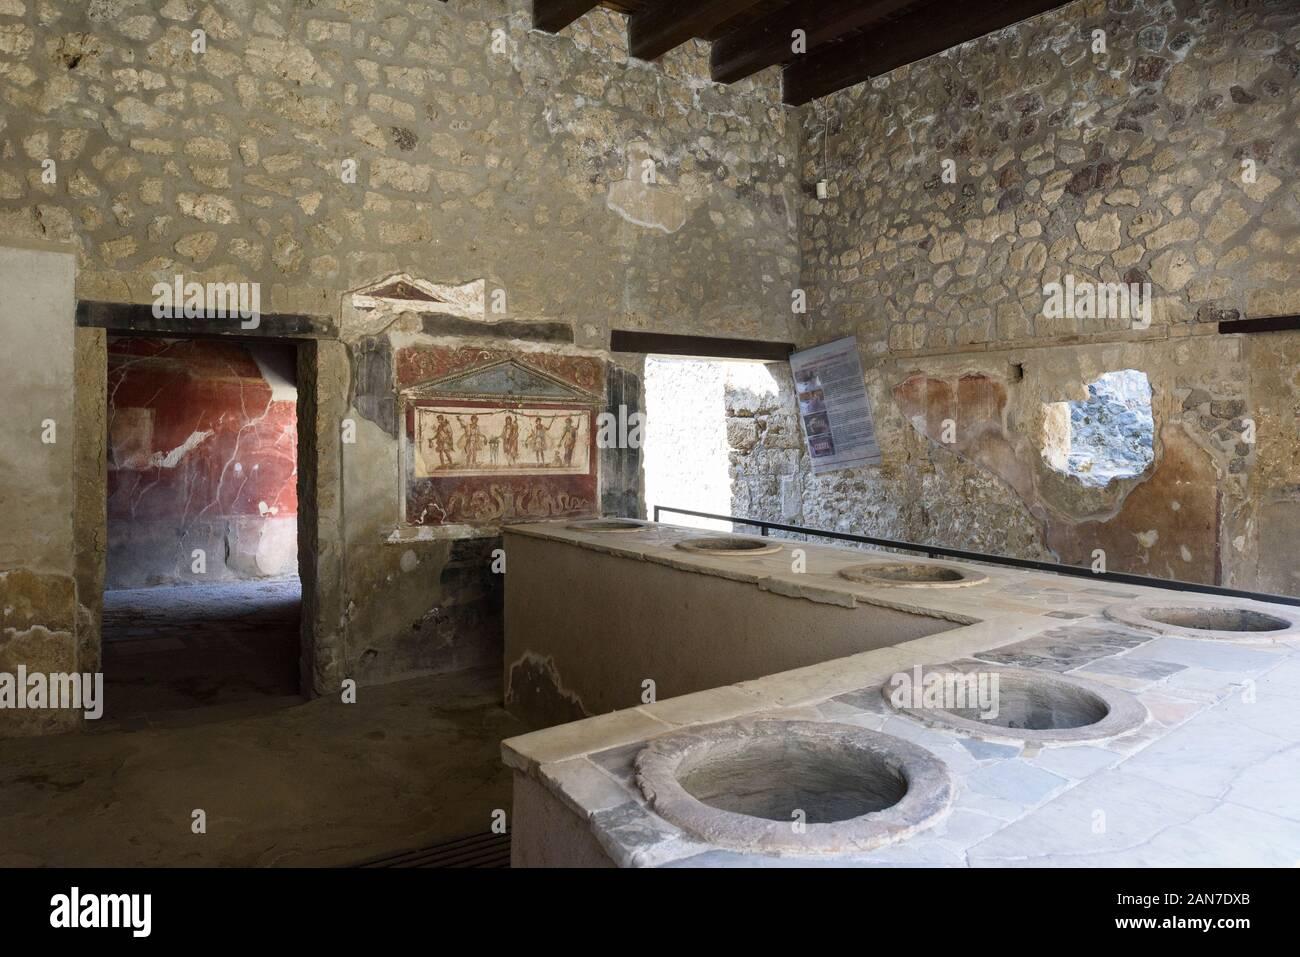 Pompei. Italia. Sitio arqueológico de Pompeya. Casa y Thermopolium de Vetutius Placidus en via dell'abbondanza (Casa e Thermopolium di Vetutius Pla Foto de stock